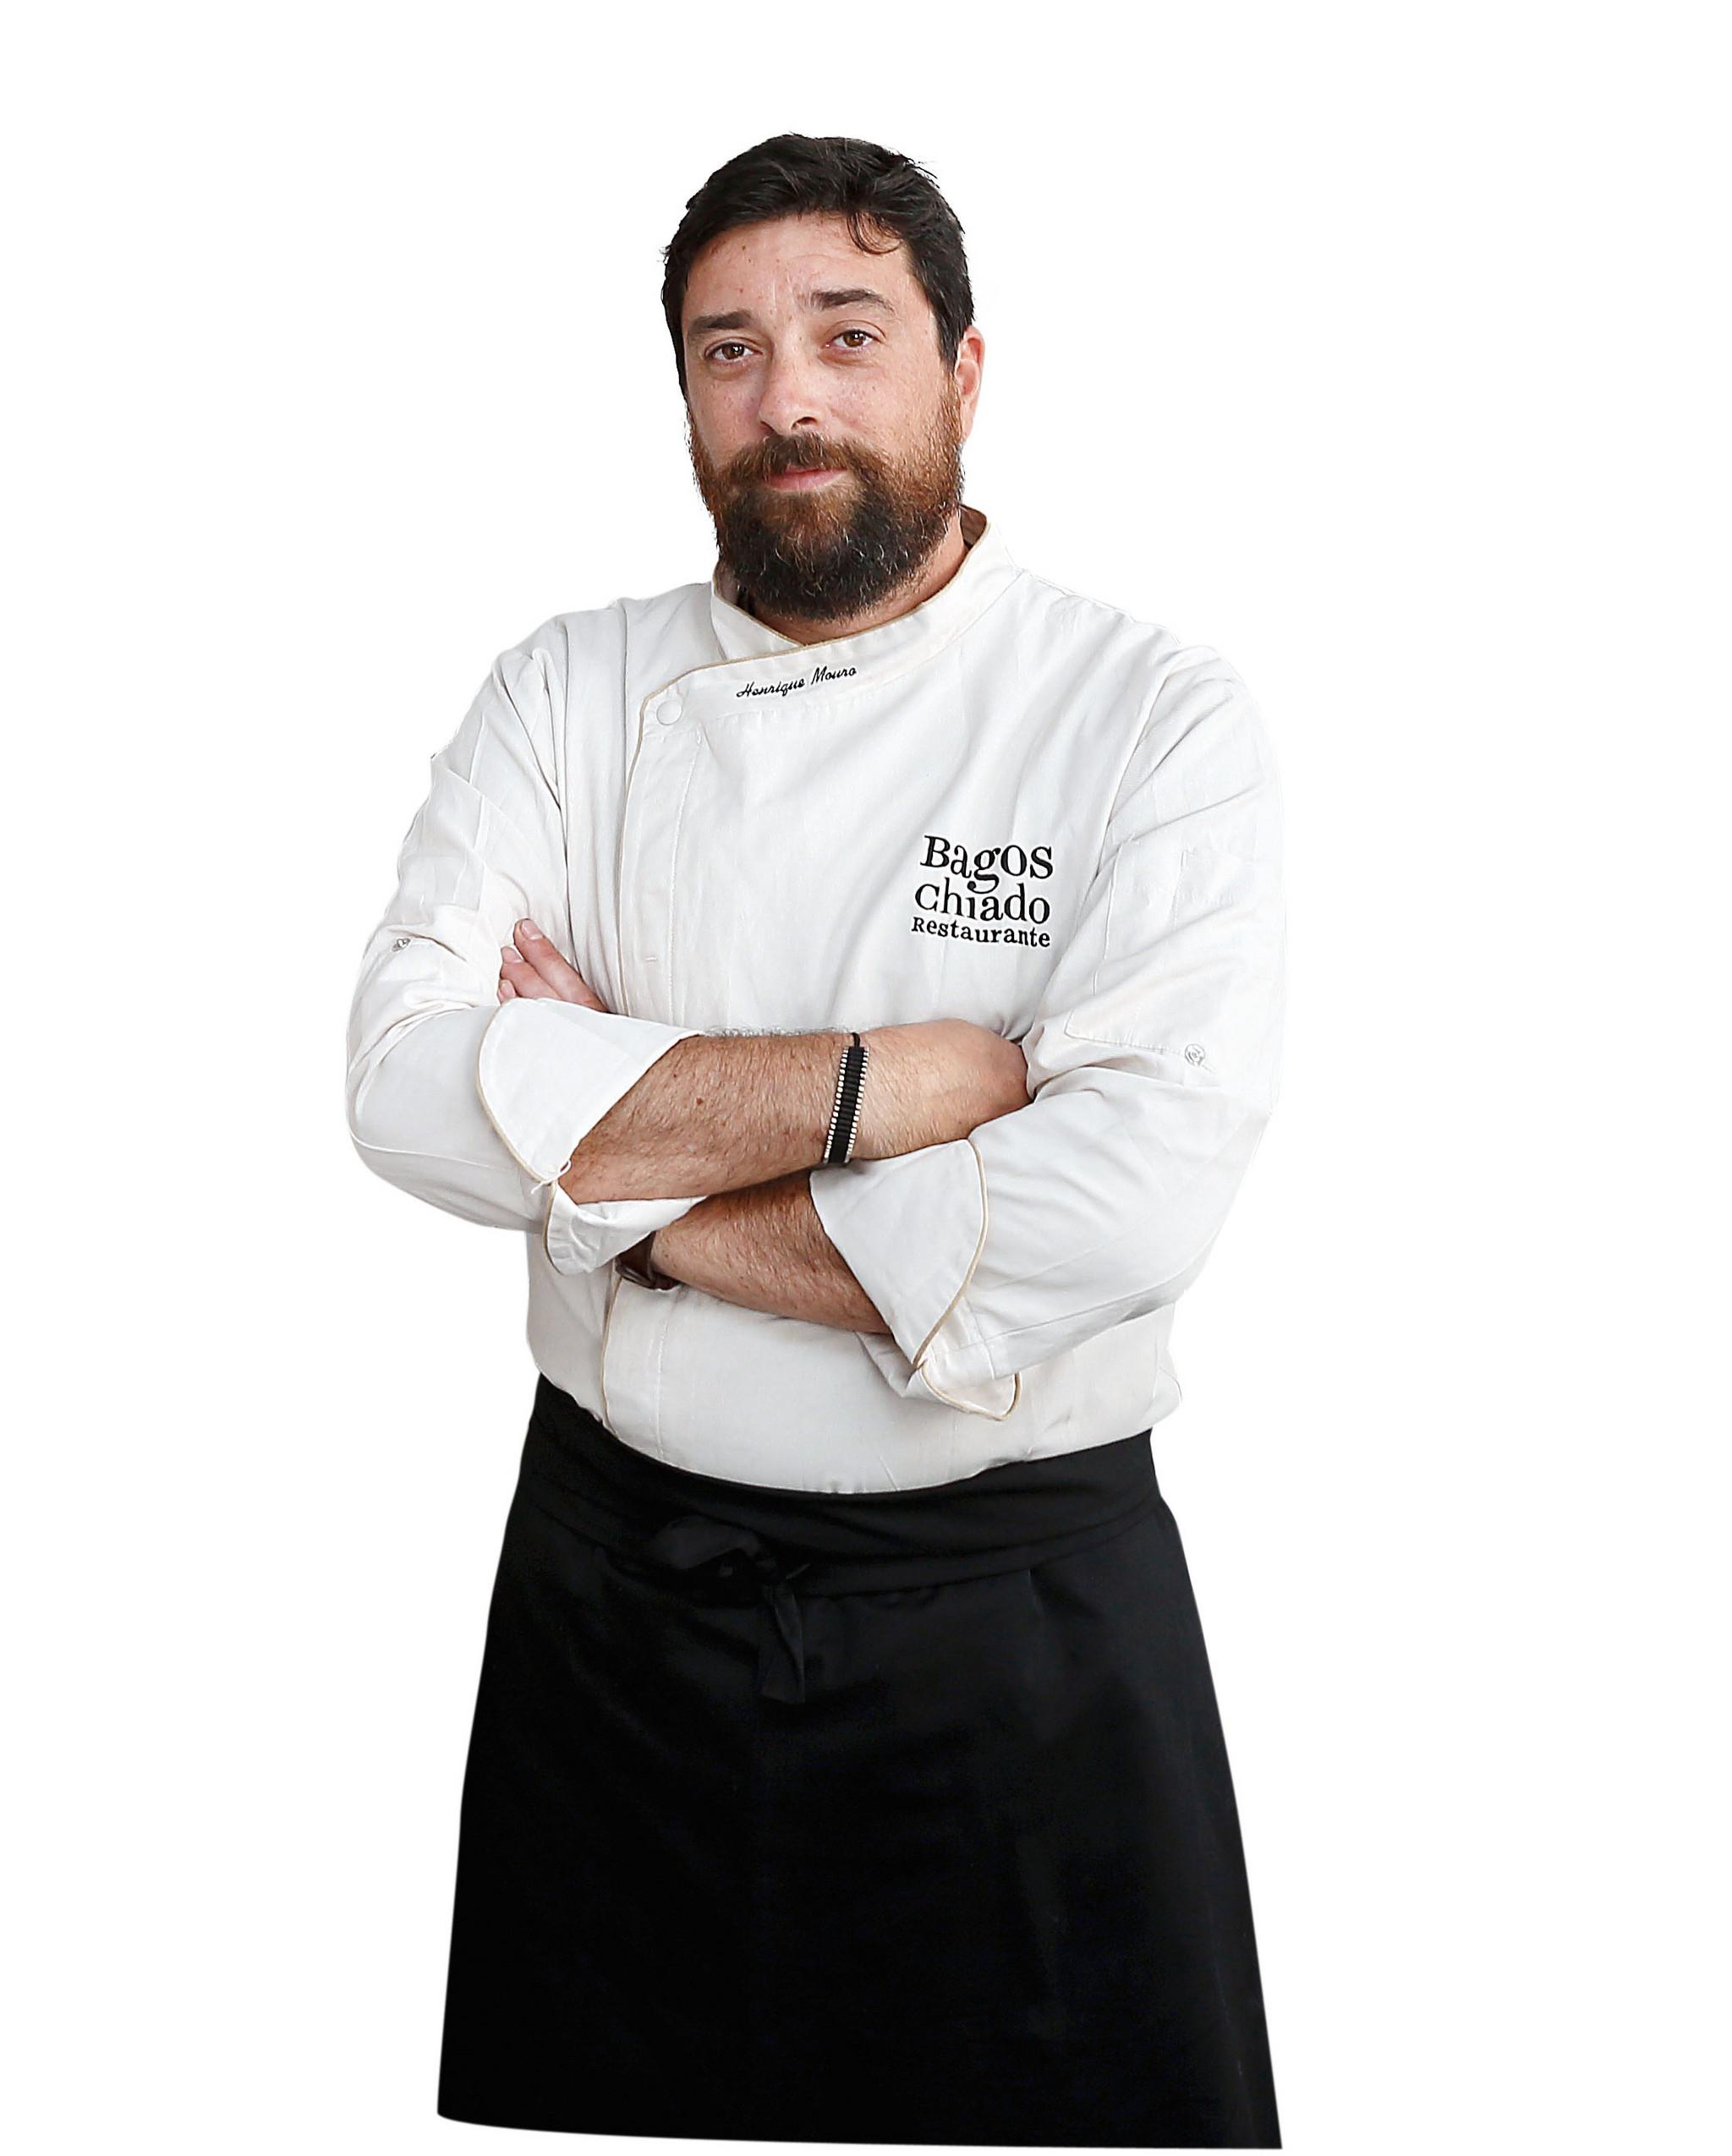 mj chef henrique mouro 4.jpg